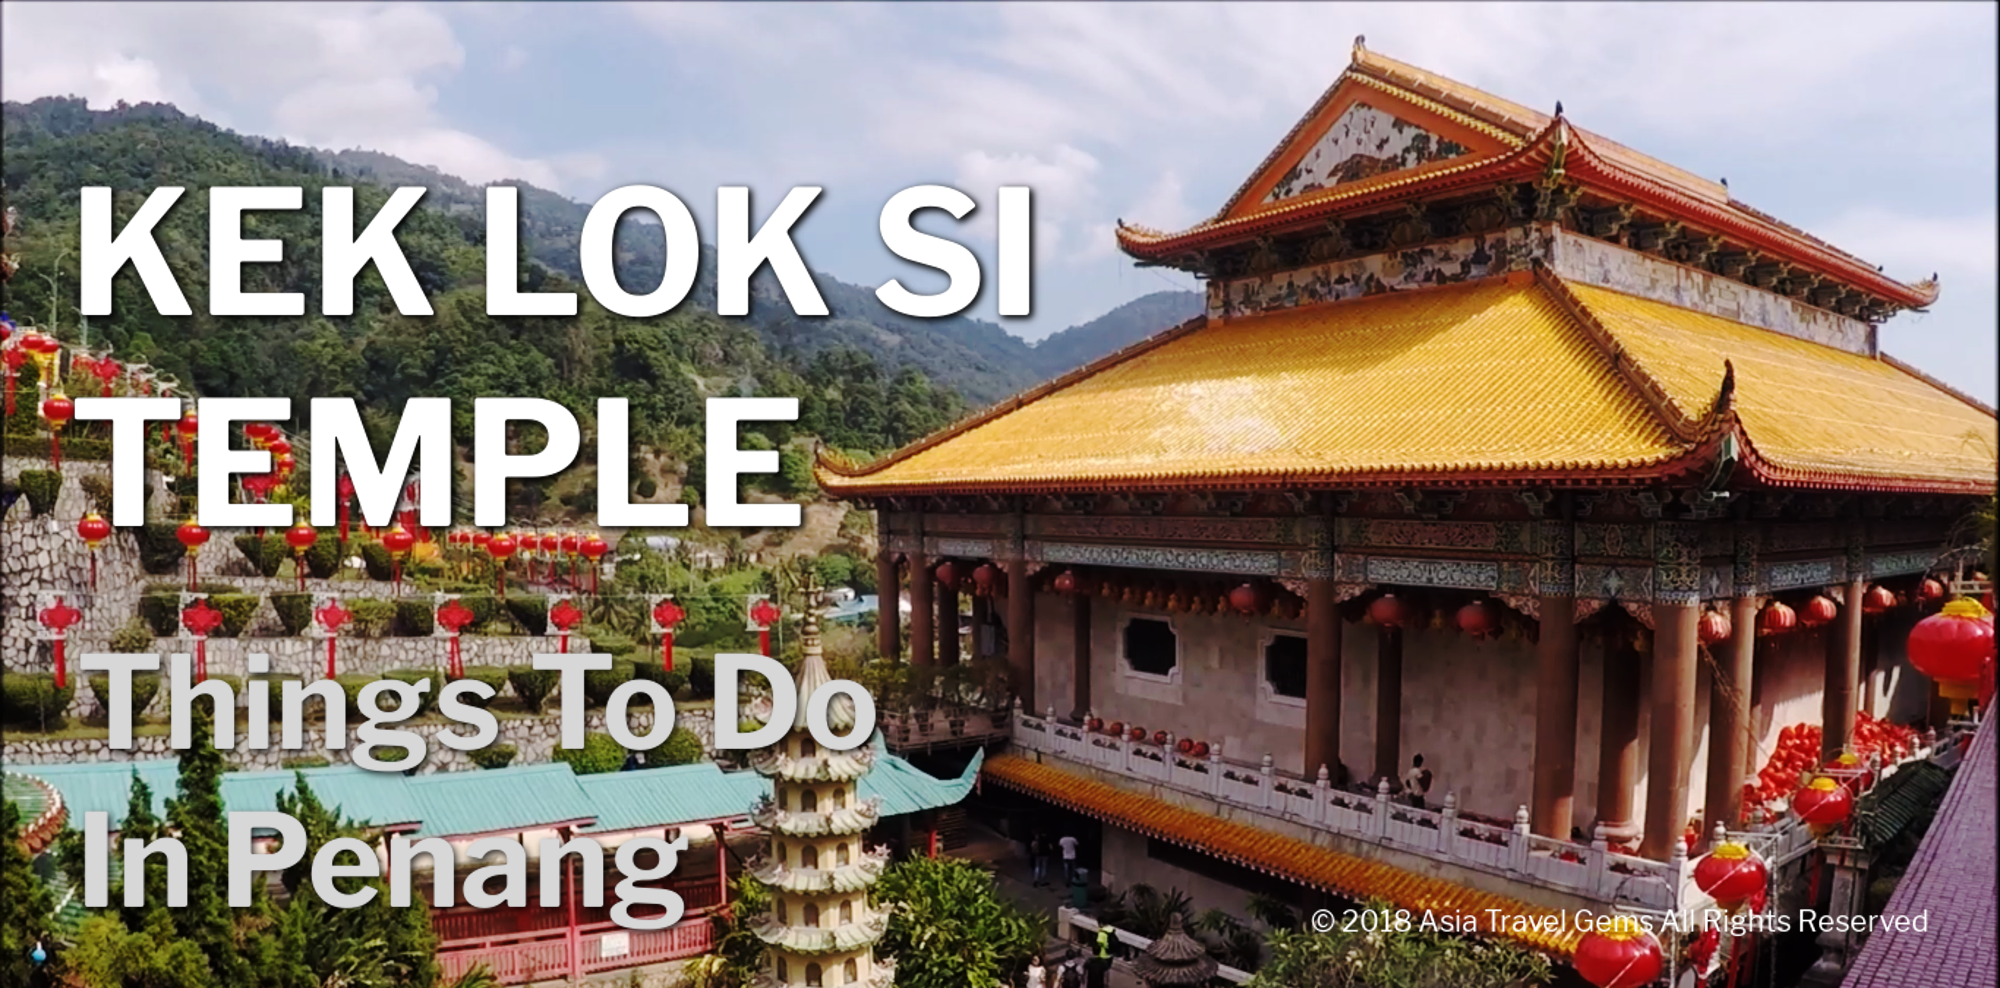 Things To Do In Penang - Kek Lok Si Temple